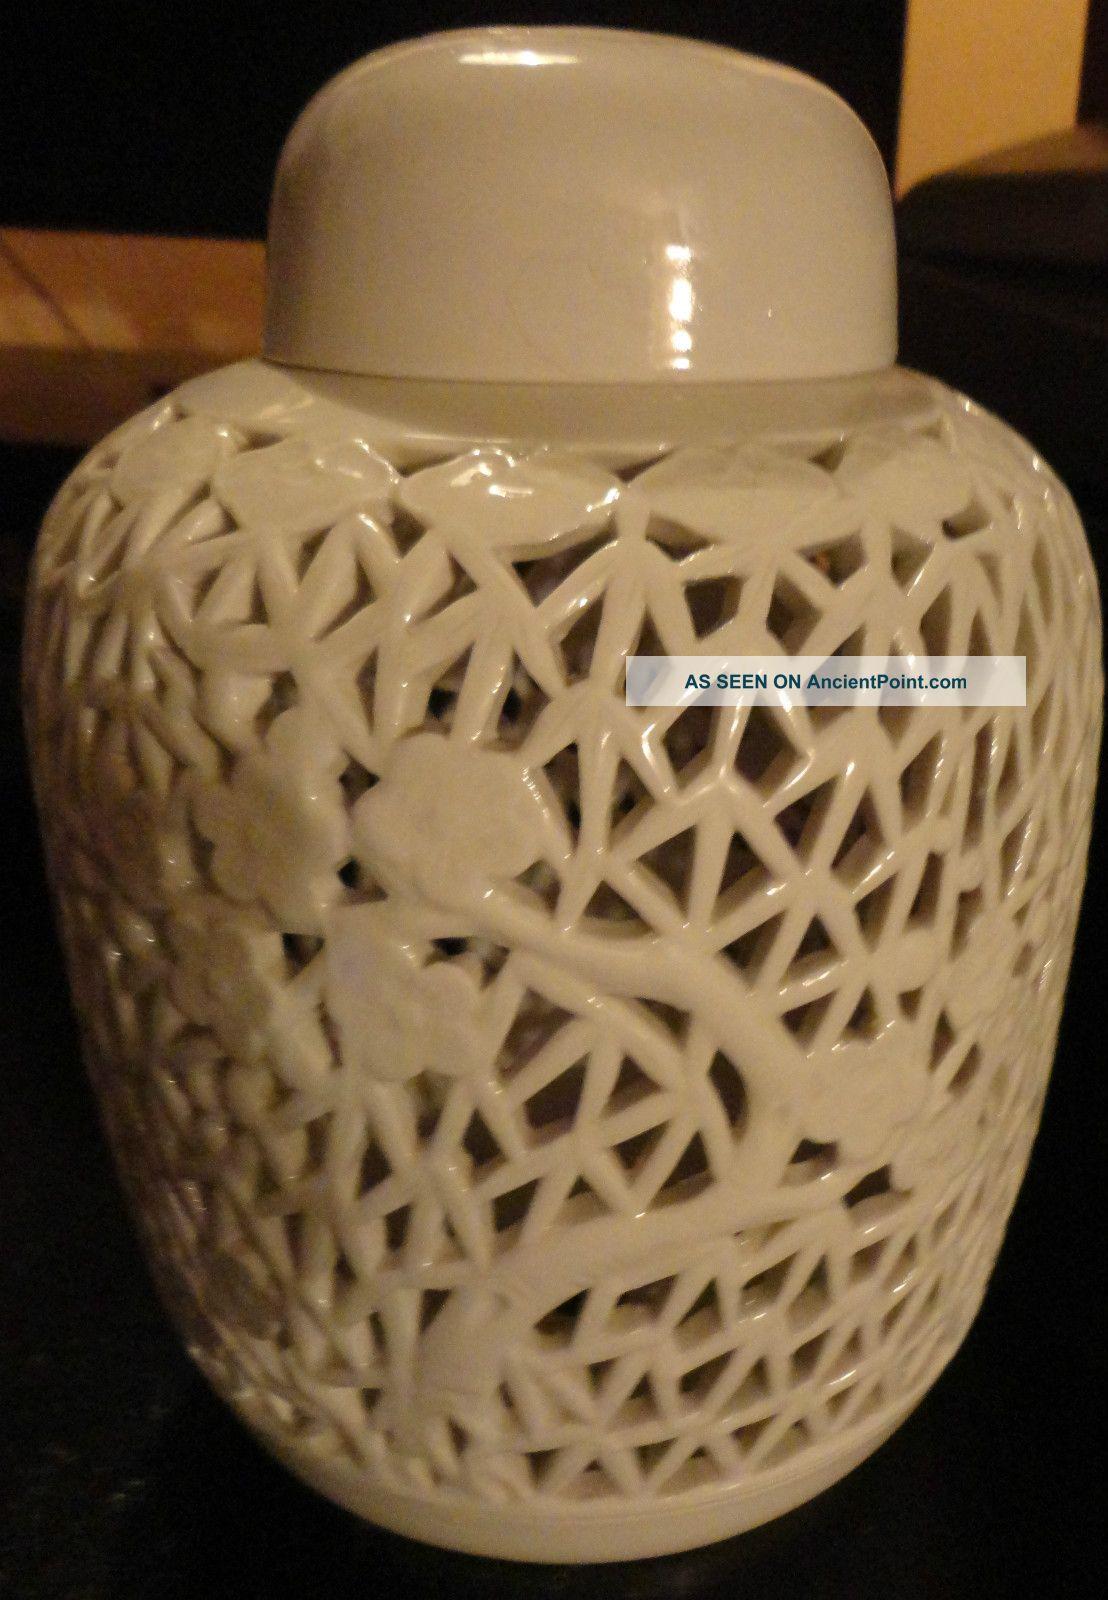 Antique Chinese Fine Porcelain Large Covered Vase - Unique 8 1/2 Inches (vase 1) Vases photo